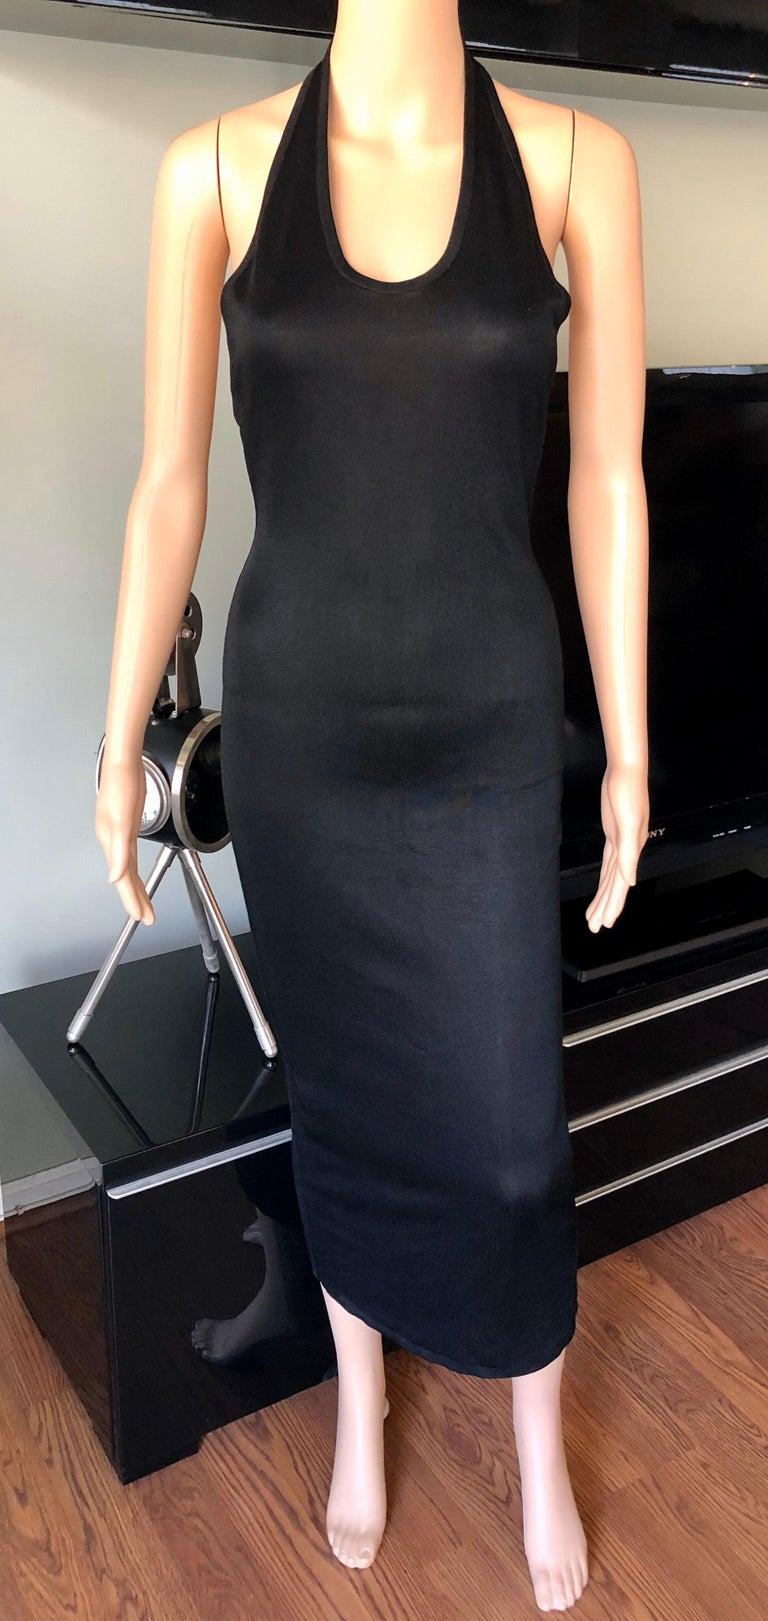 Azzedine Alaia Vintage Bodycon Halter Backless Black Dress 1